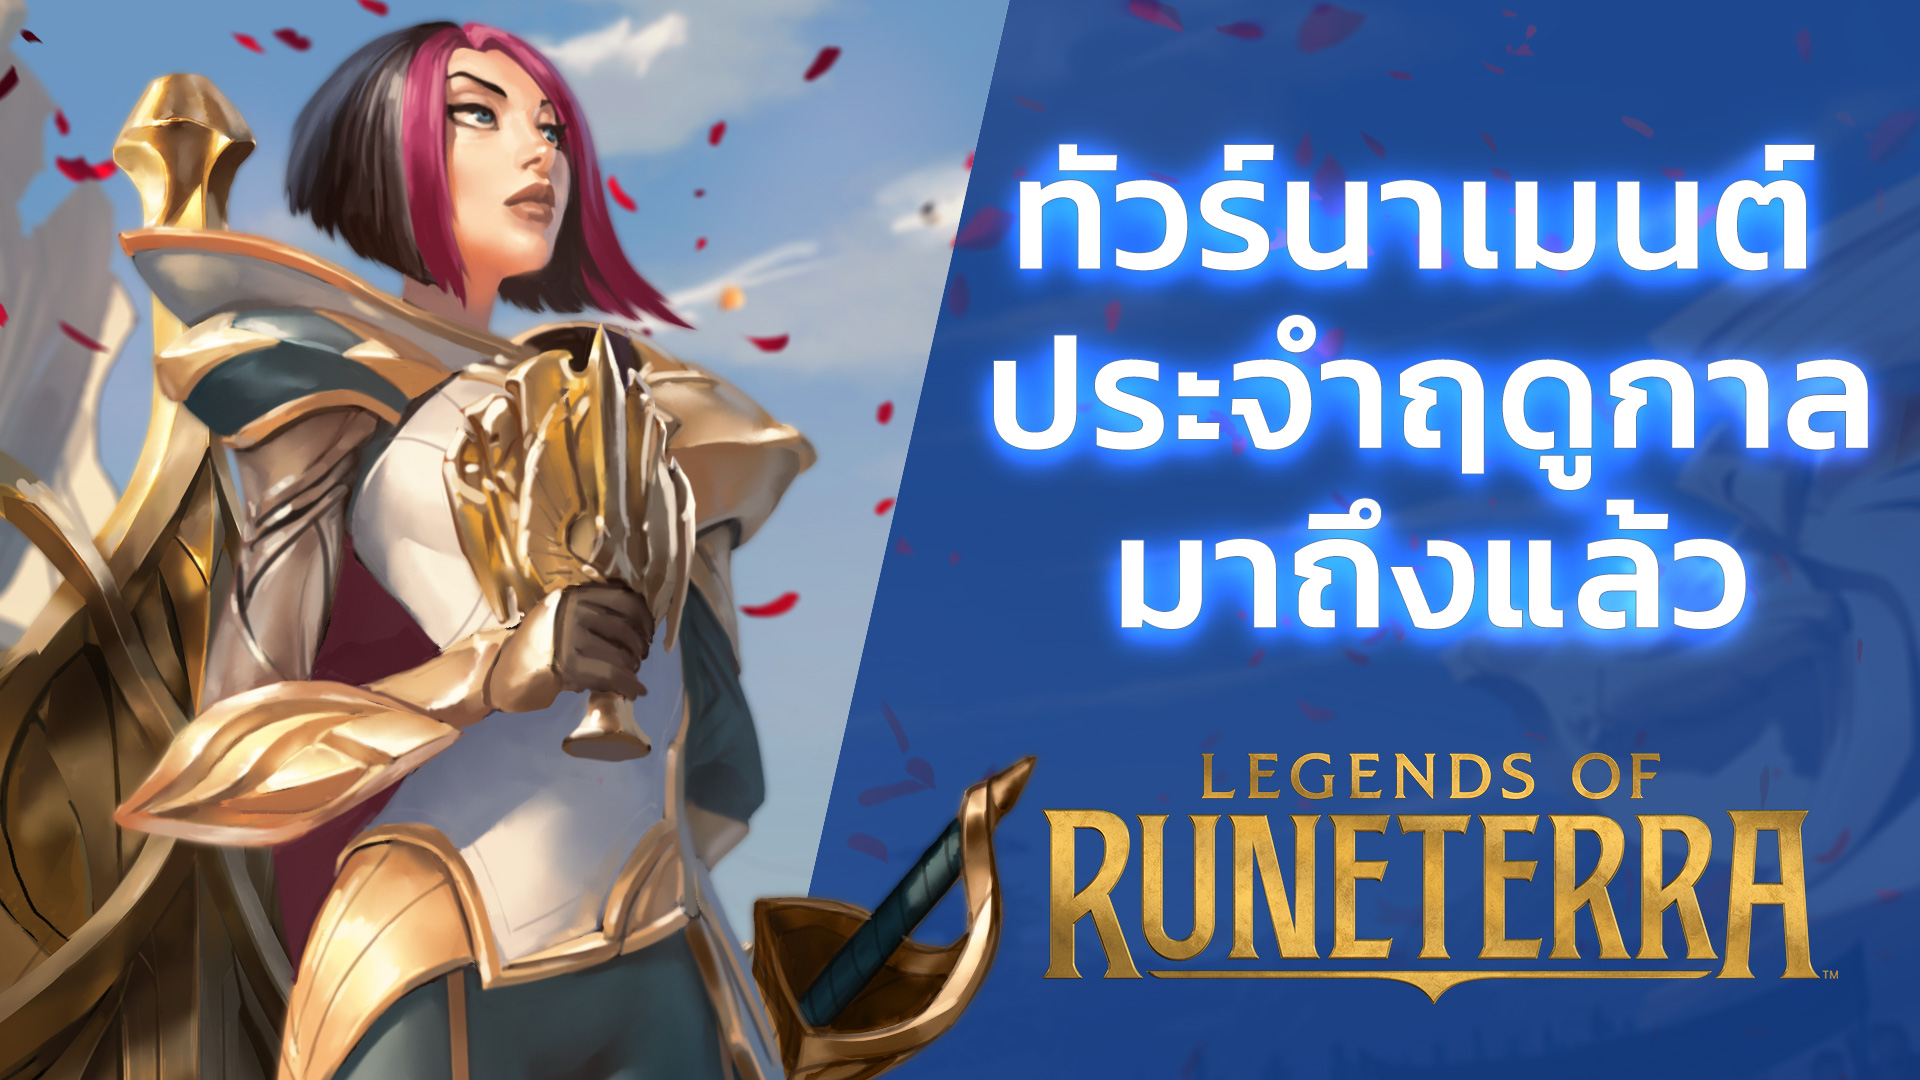 Legends of Runeterra 20102020 2